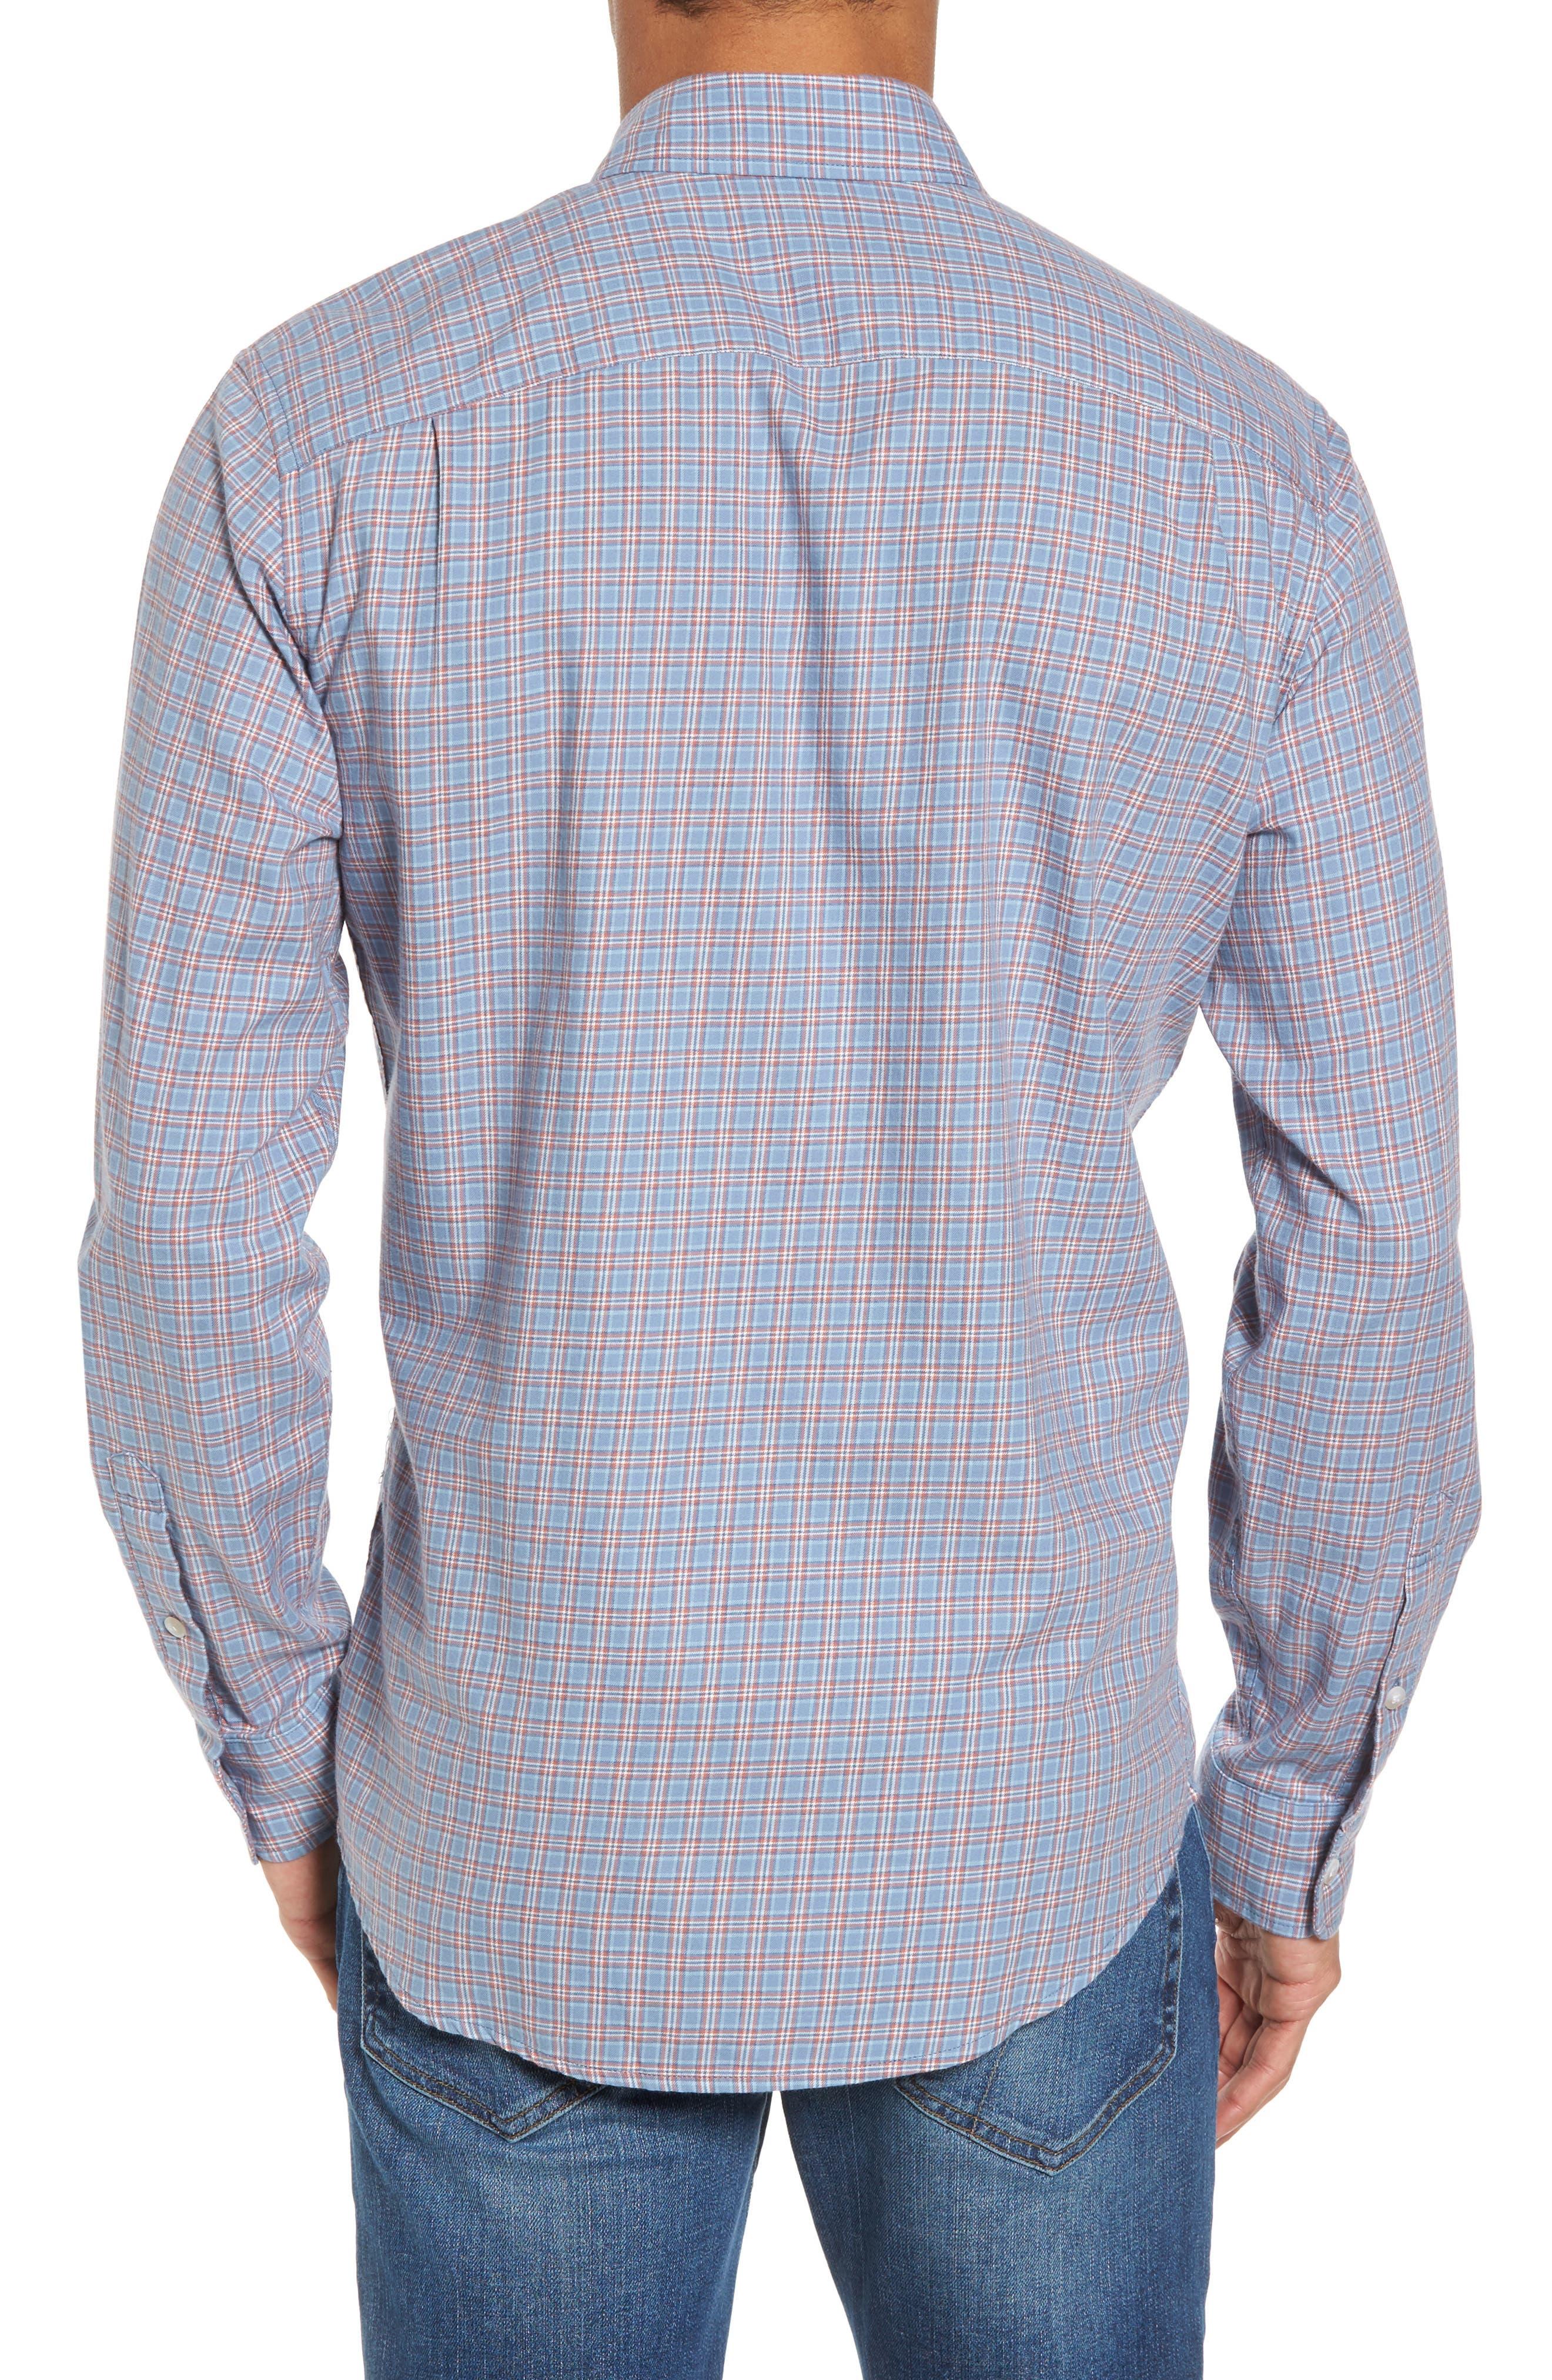 Ventura Plaid Sport Shirt,                             Alternate thumbnail 2, color,                             Light Blue Autumn Check